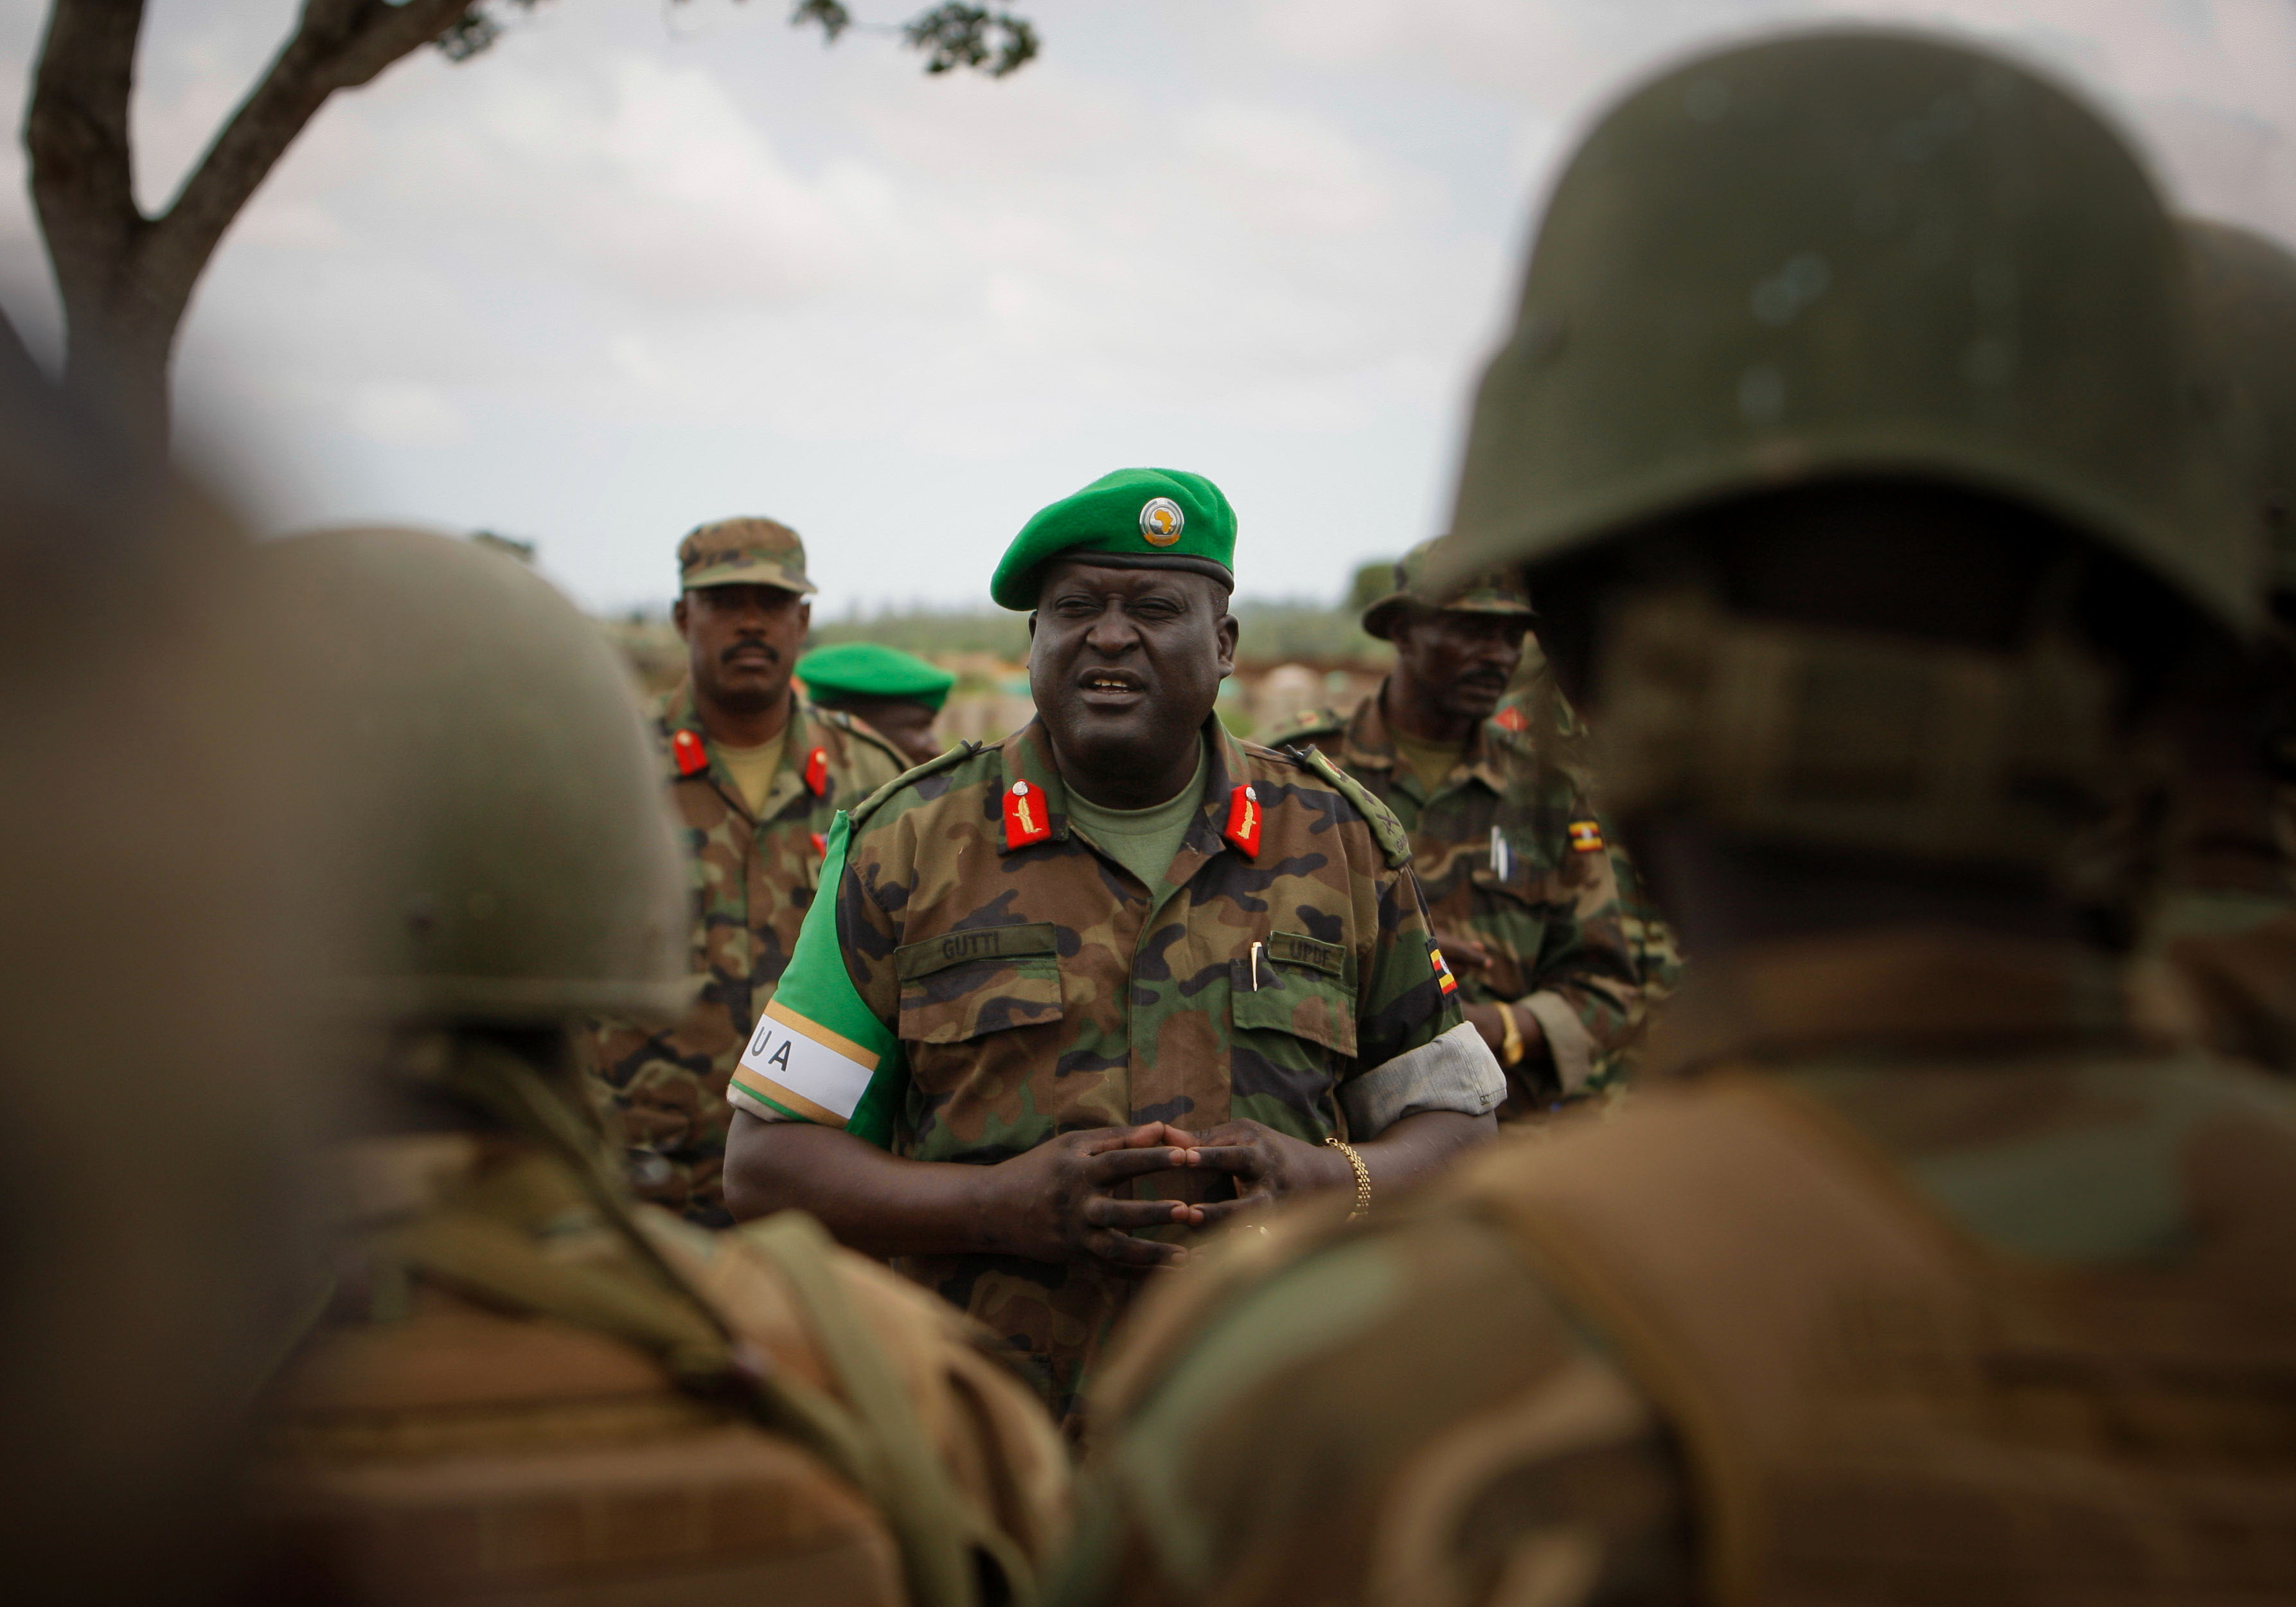 AMISOM Force Commander tours Afgoye Corridor 03, Afgoye, AMISOM, Commander, Force, HQ Photo